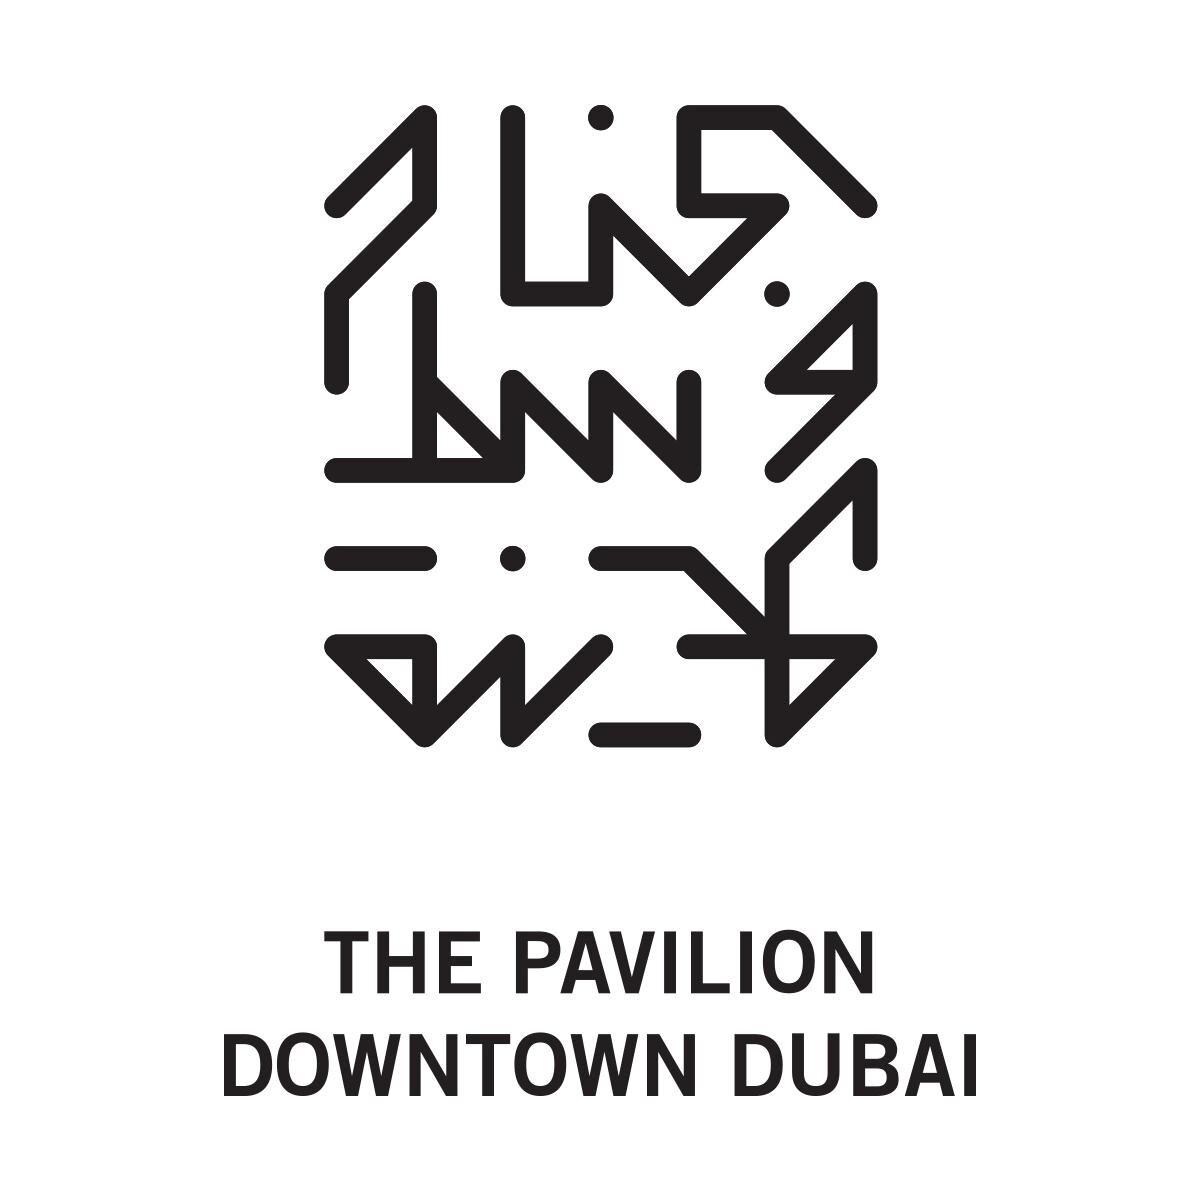 @PavilionDubai